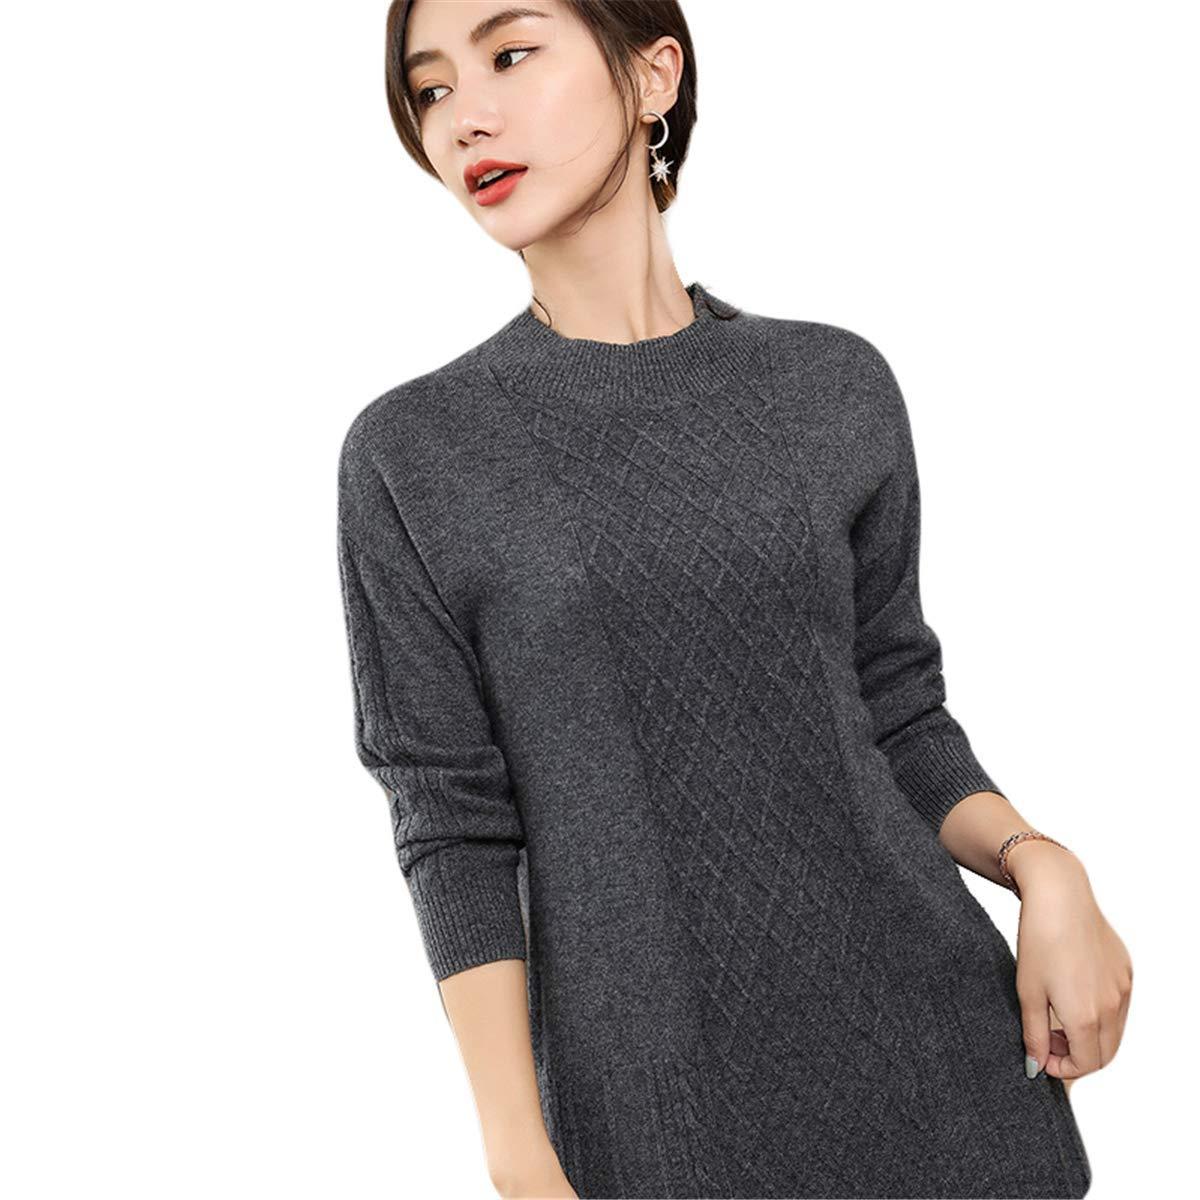 Dark Grey MCieloLuna Women's 100% Cashmere Soft Knit Turtleneck Sweater Dress